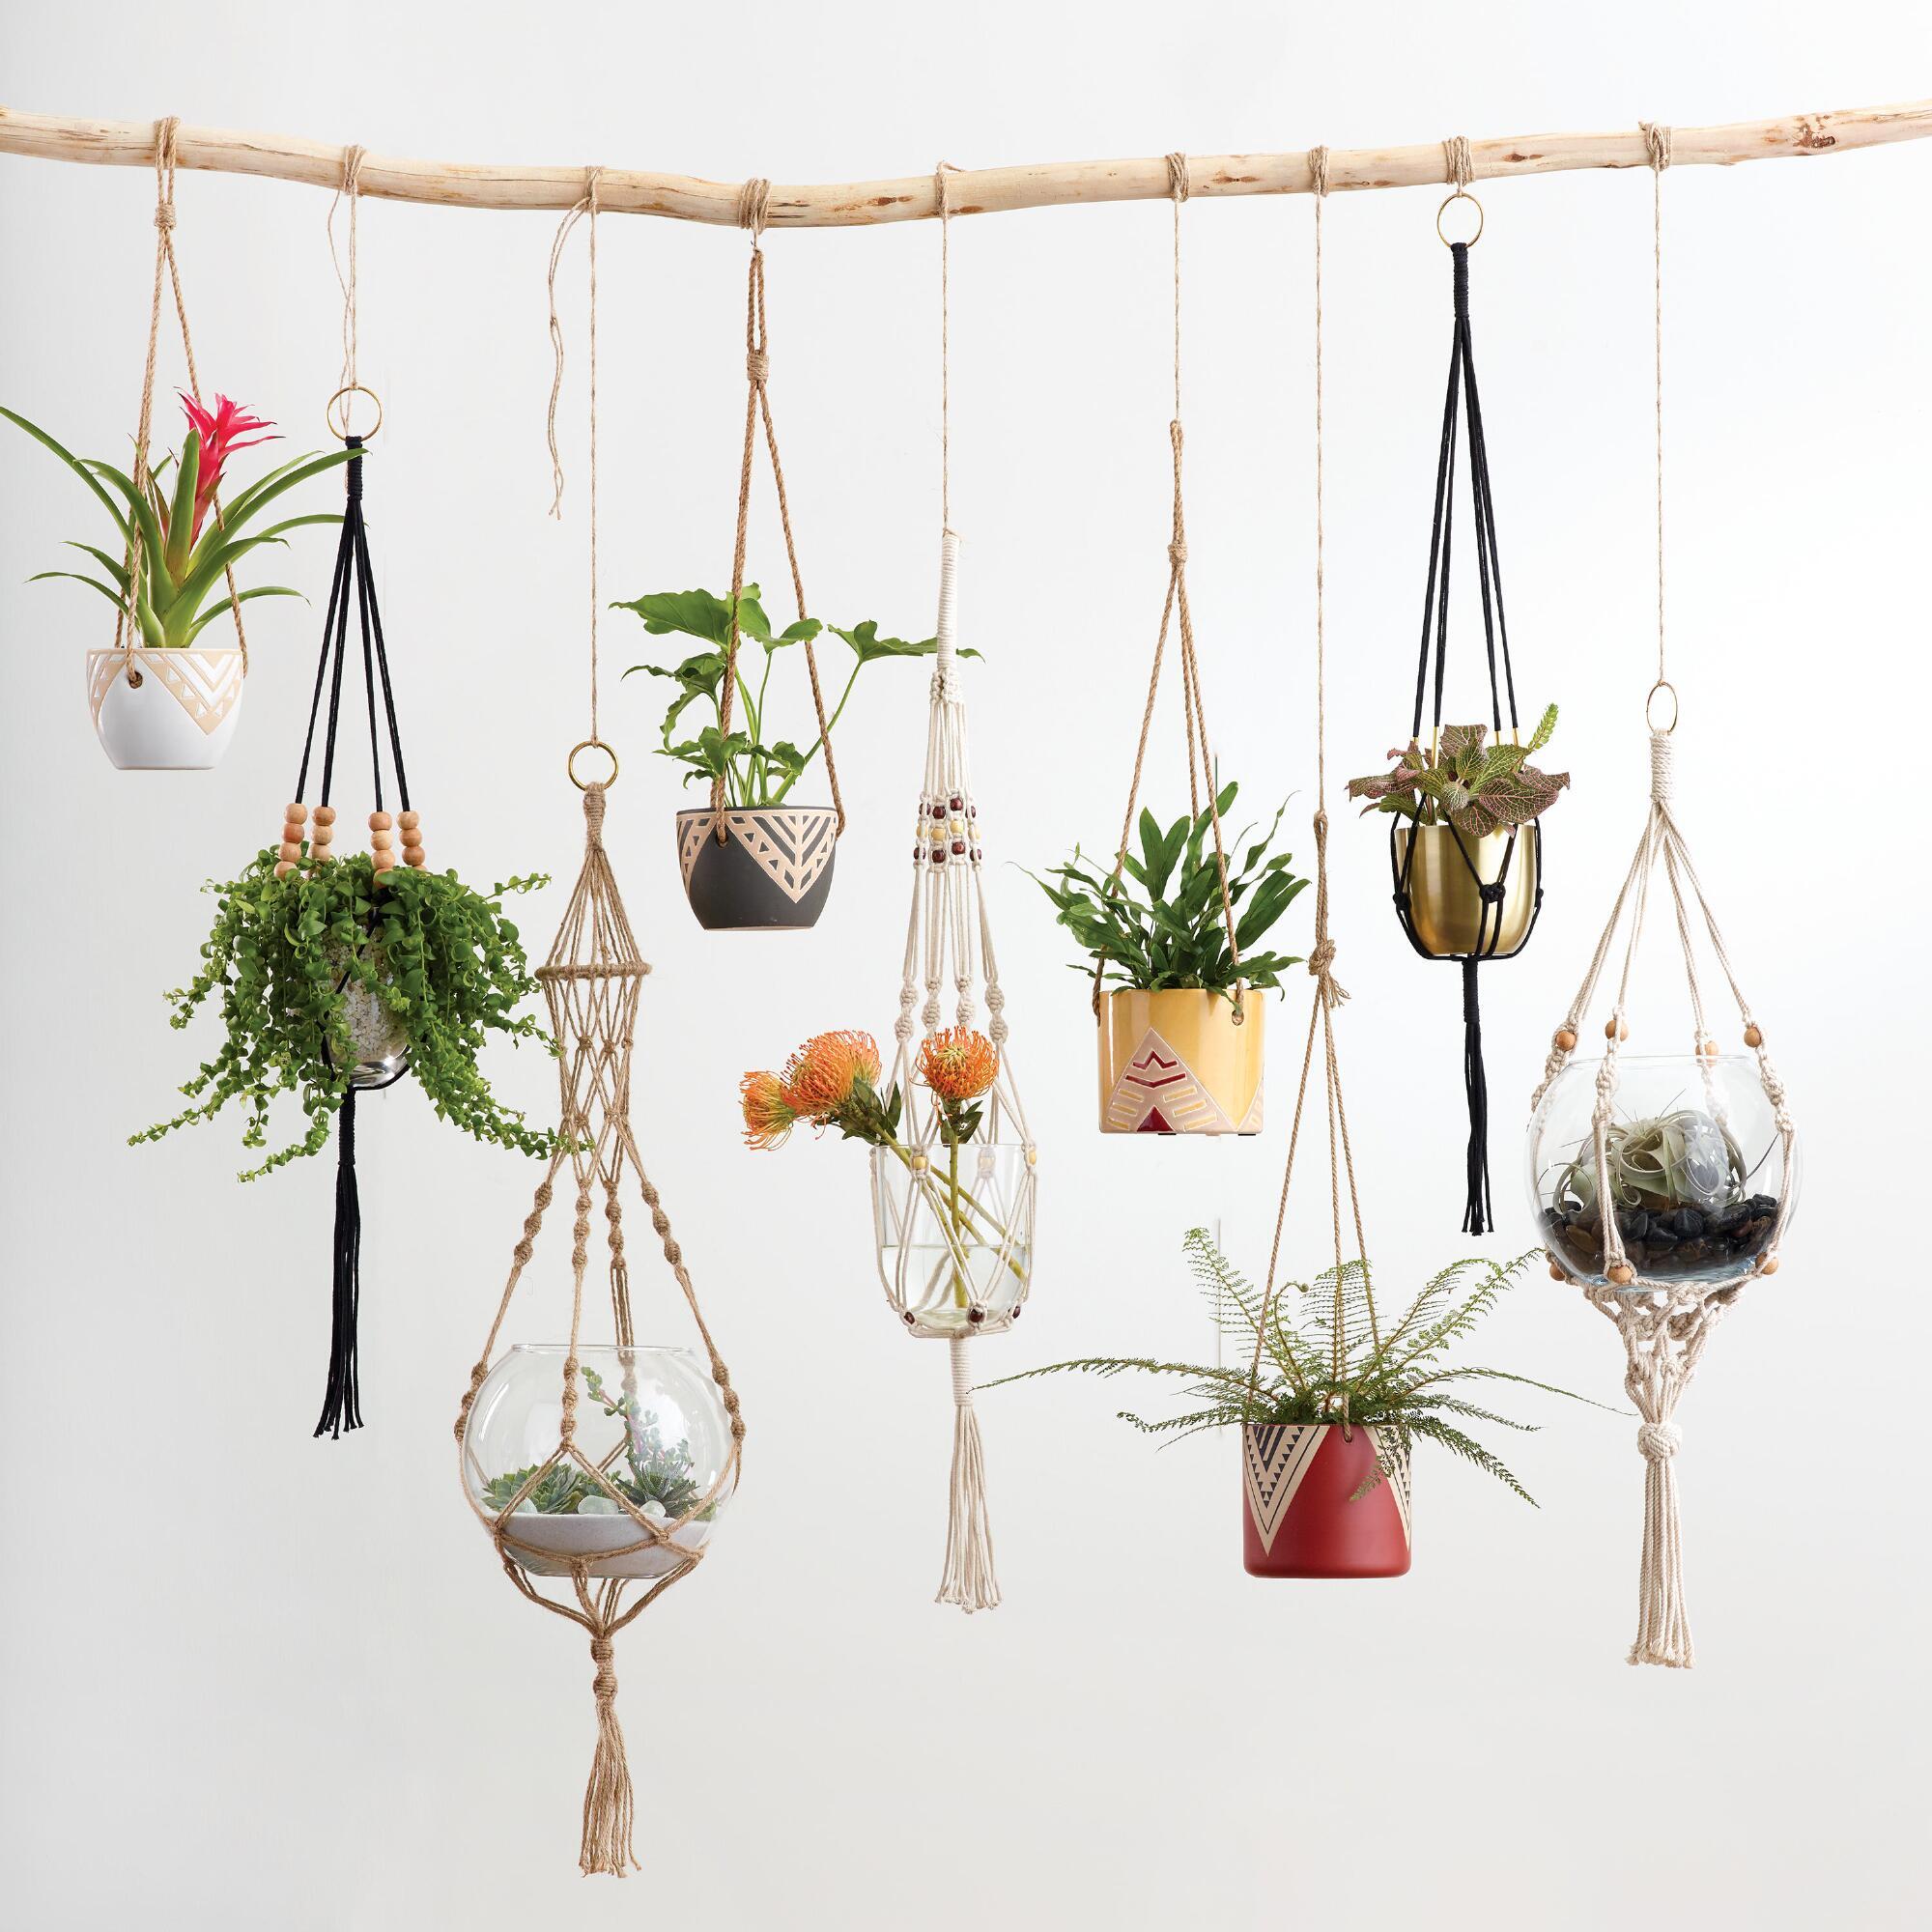 00- world market woven hangers